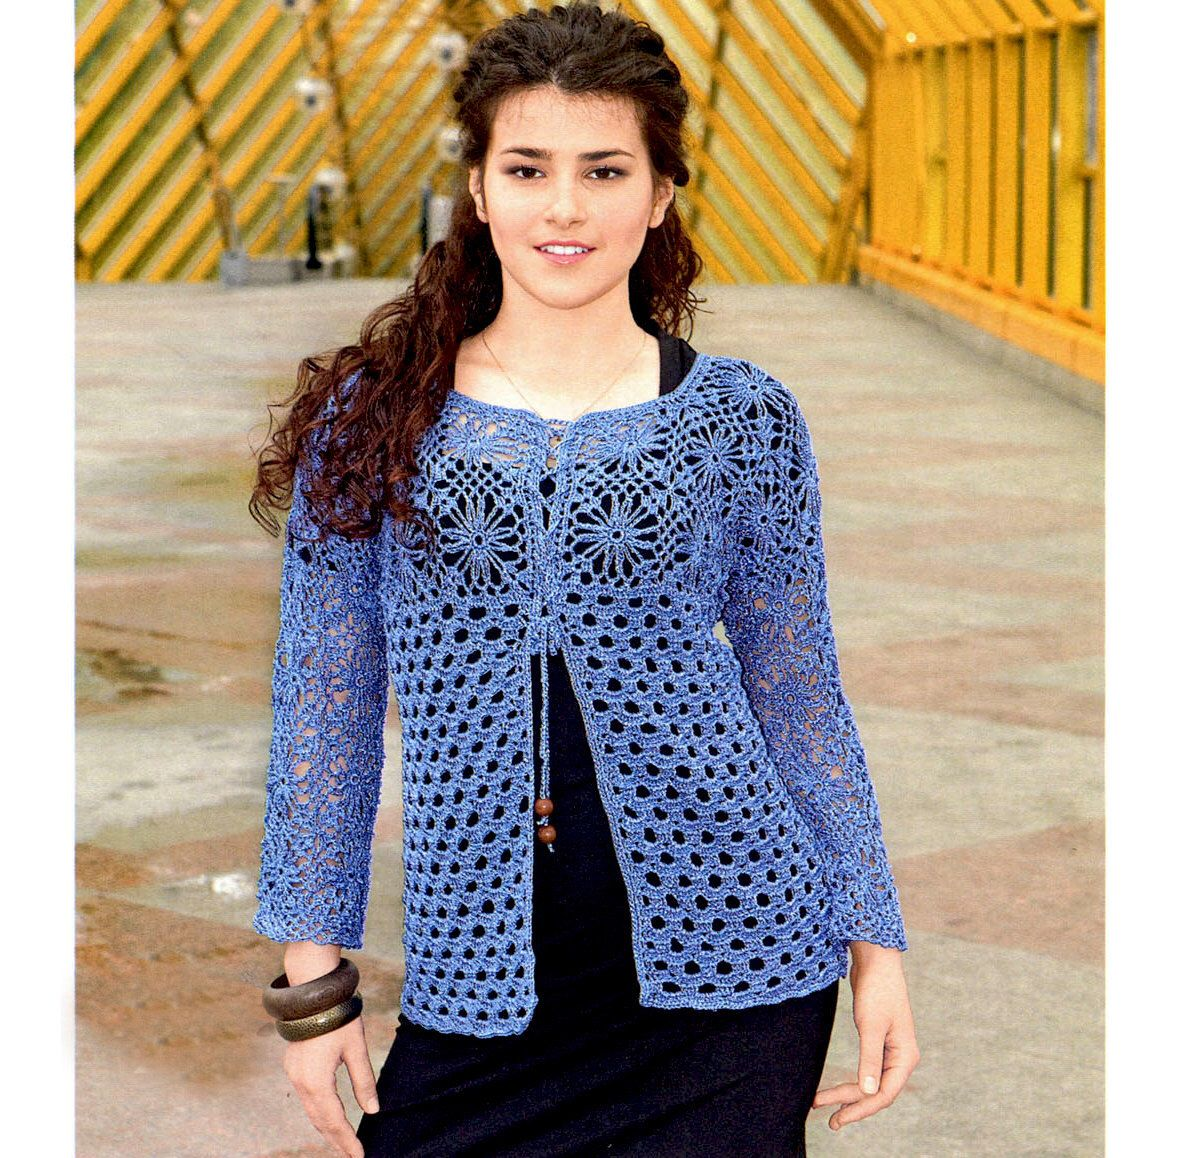 Crochet blouse pattern detailed tutorial in english long sleeves crochet blouse pattern detailed tutorial in english long sleeves crochet sweater pattern casual crochet sweater crochet tunic pattern bankloansurffo Images